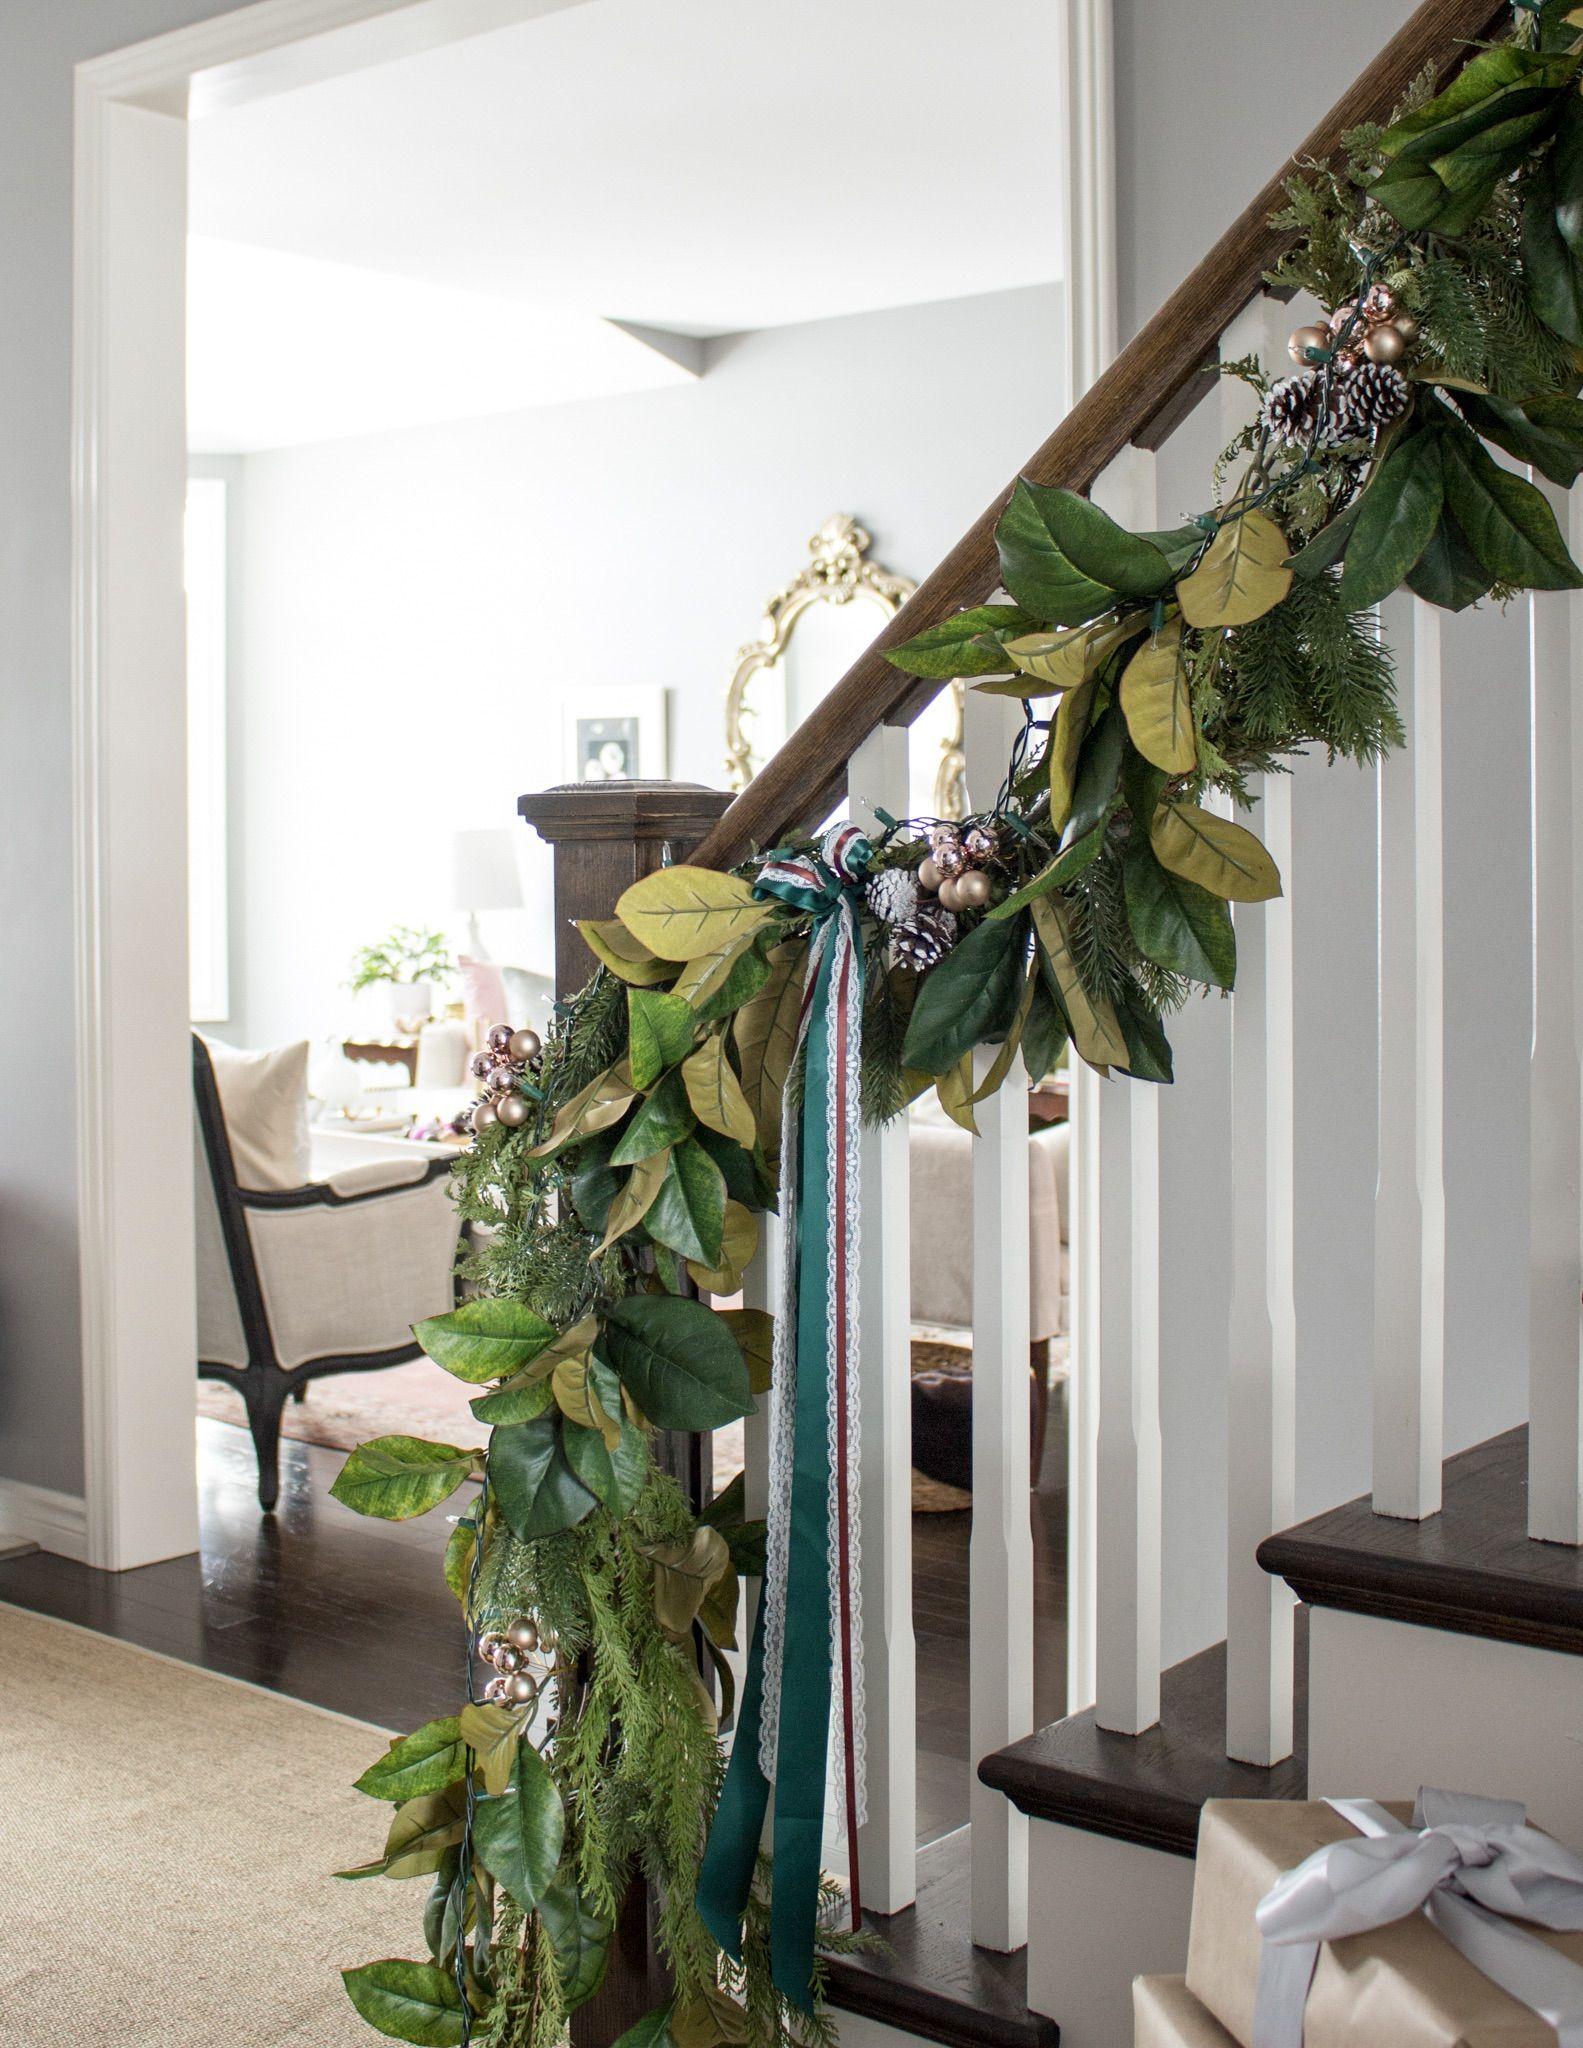 Magnolia garland Magnolia garland, Christmas interiors